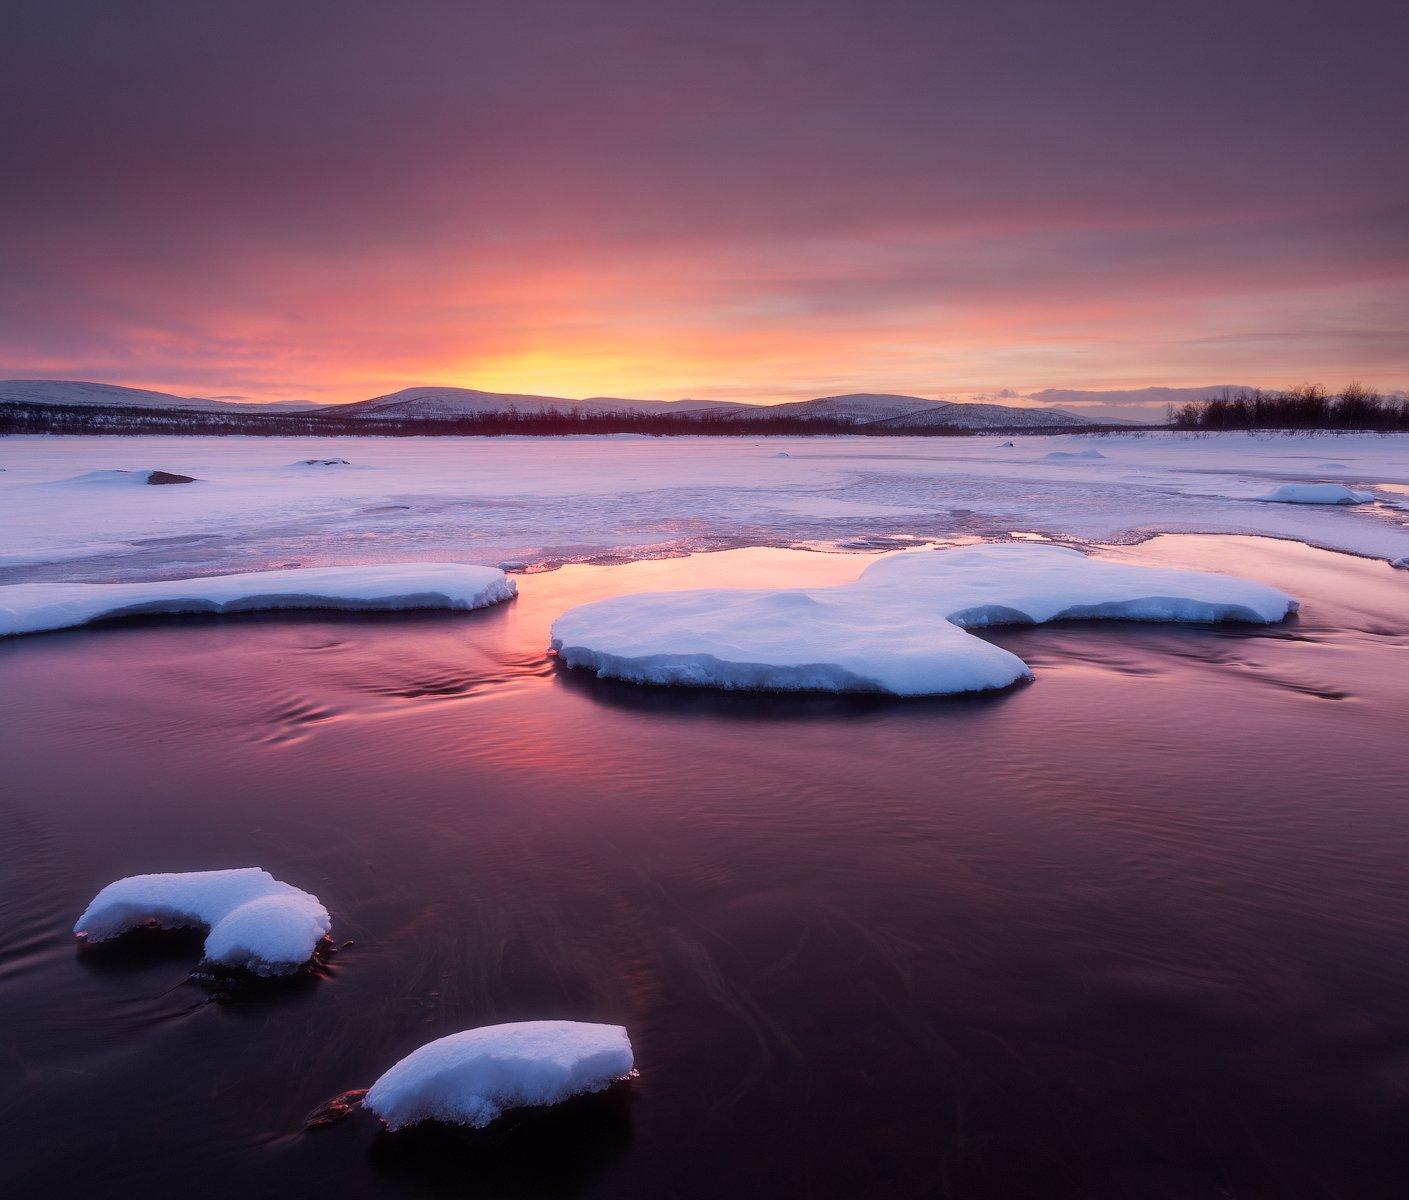 lapland, finland, polar,sunset, Сергей Сутковой